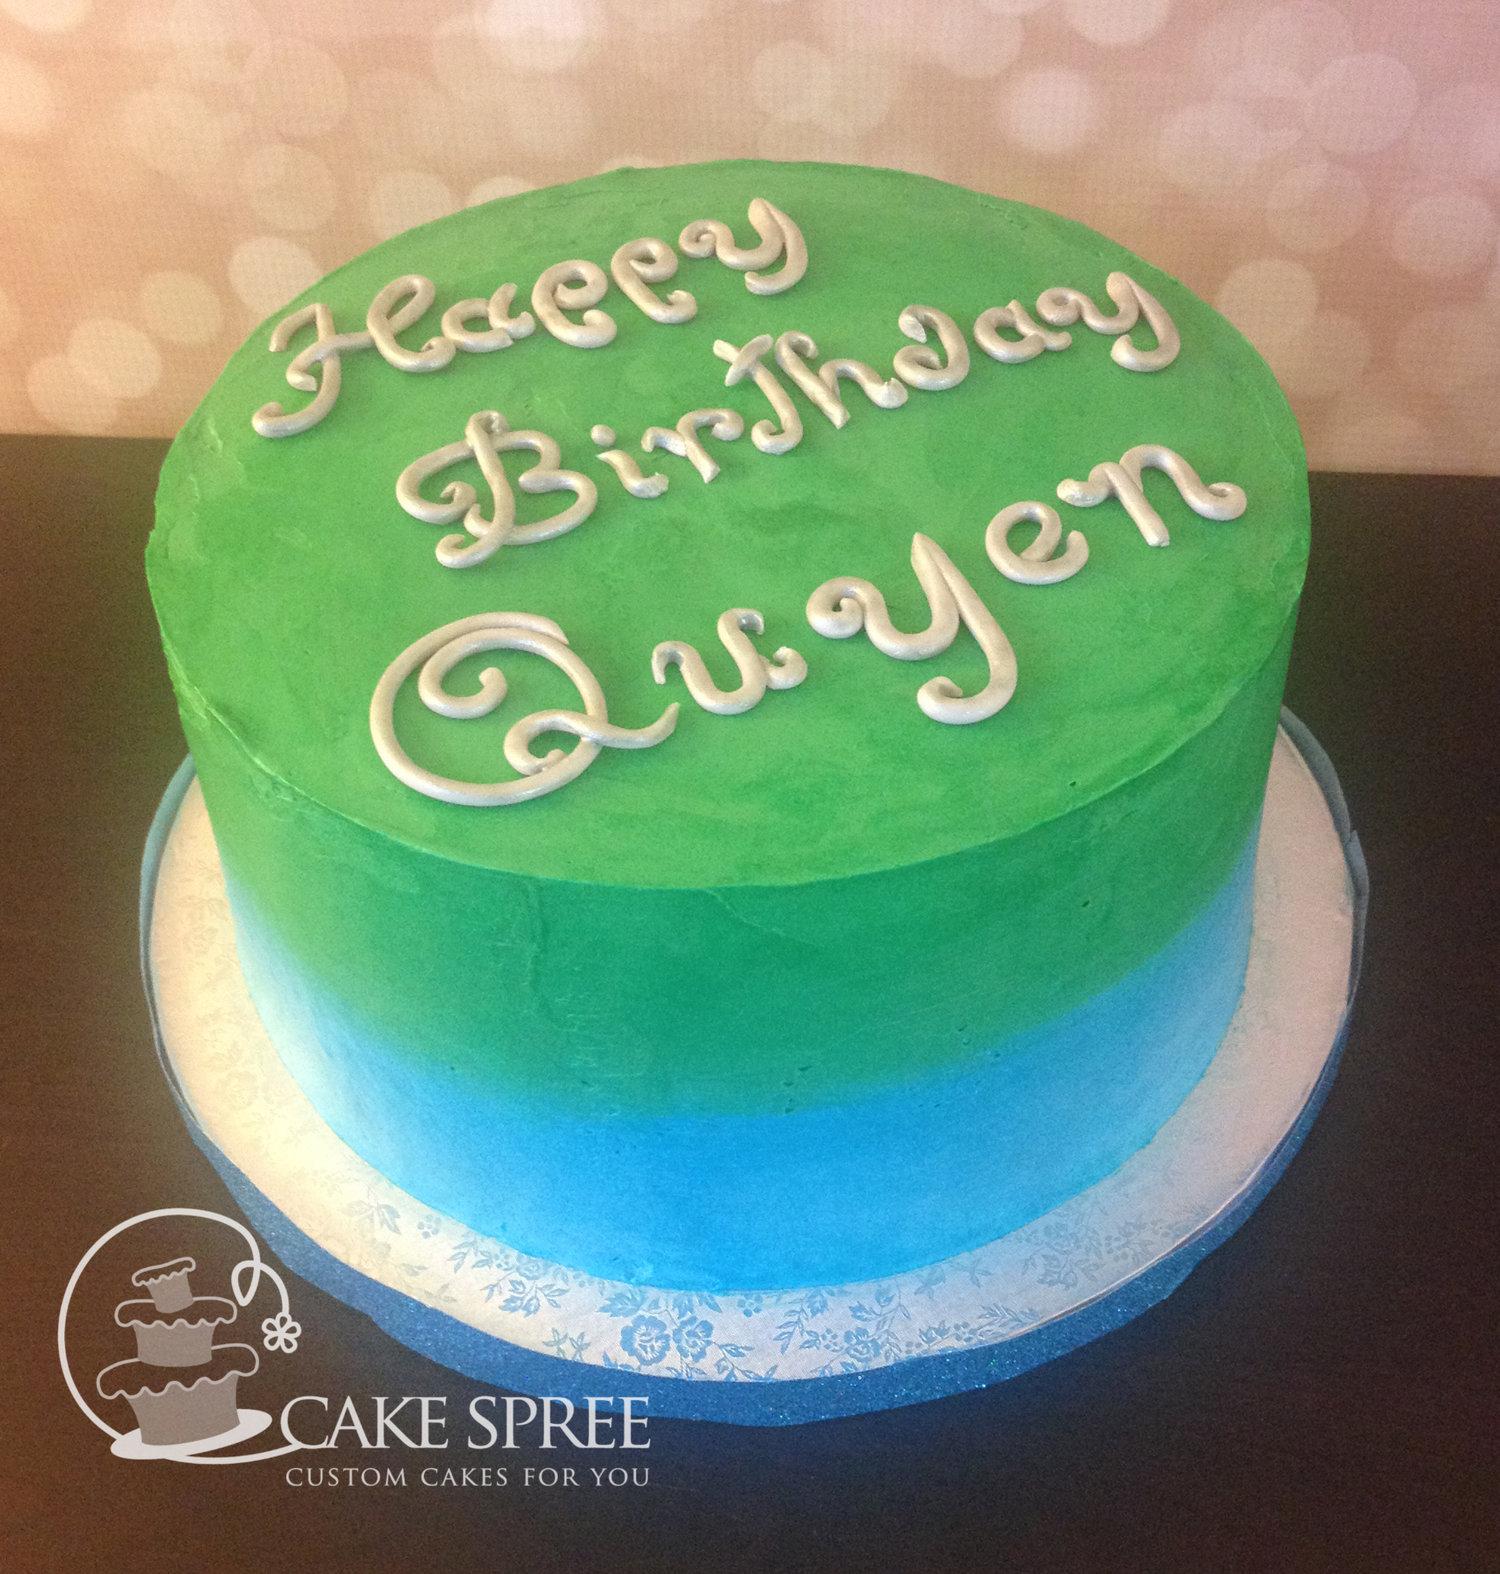 Cakes For Grownups Cake Spree